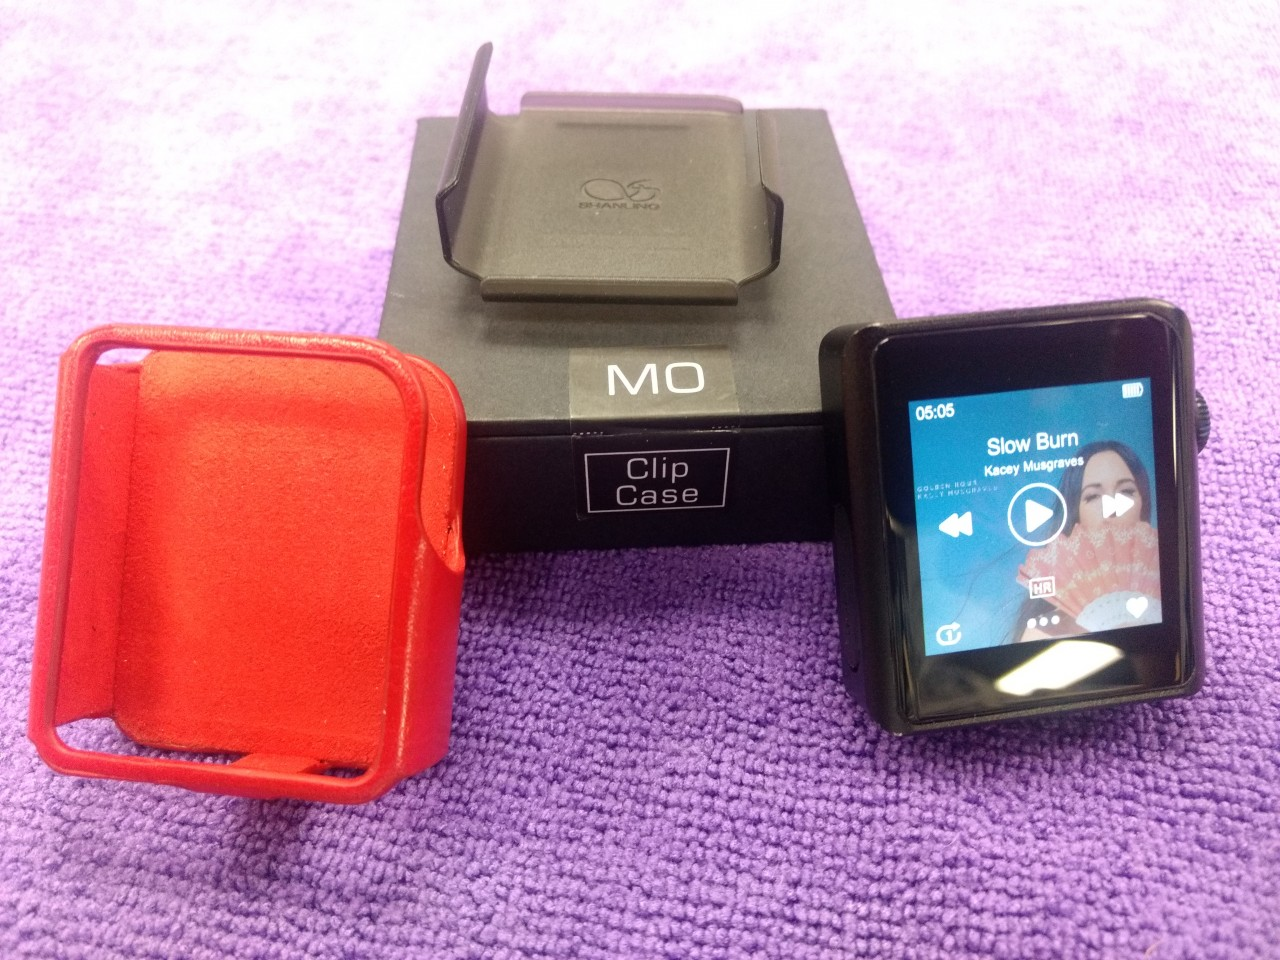 Shanling M0 - Nano size, touch screen, LDAC & aptX BT, USB